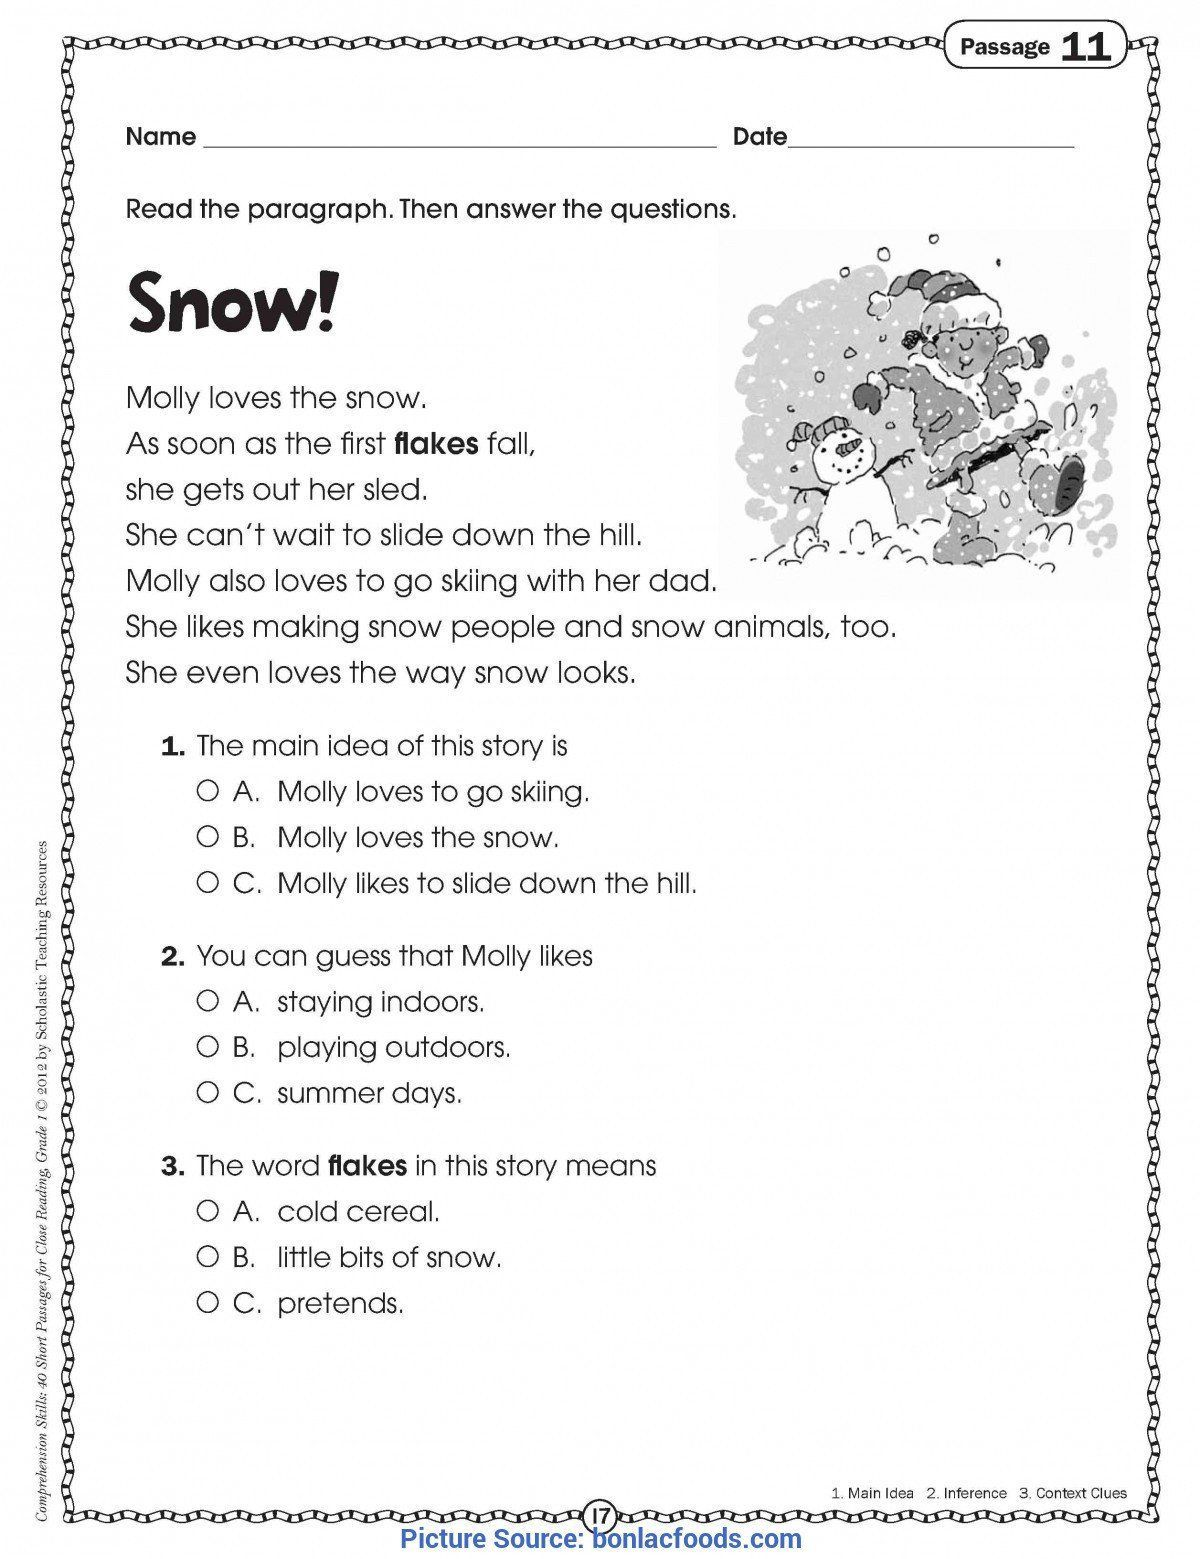 20 Free Printable Reading Comprehension Worksheets For 1st Grade Reading Worksheets 1st Grade Reading Worksheets Main Idea Worksheet